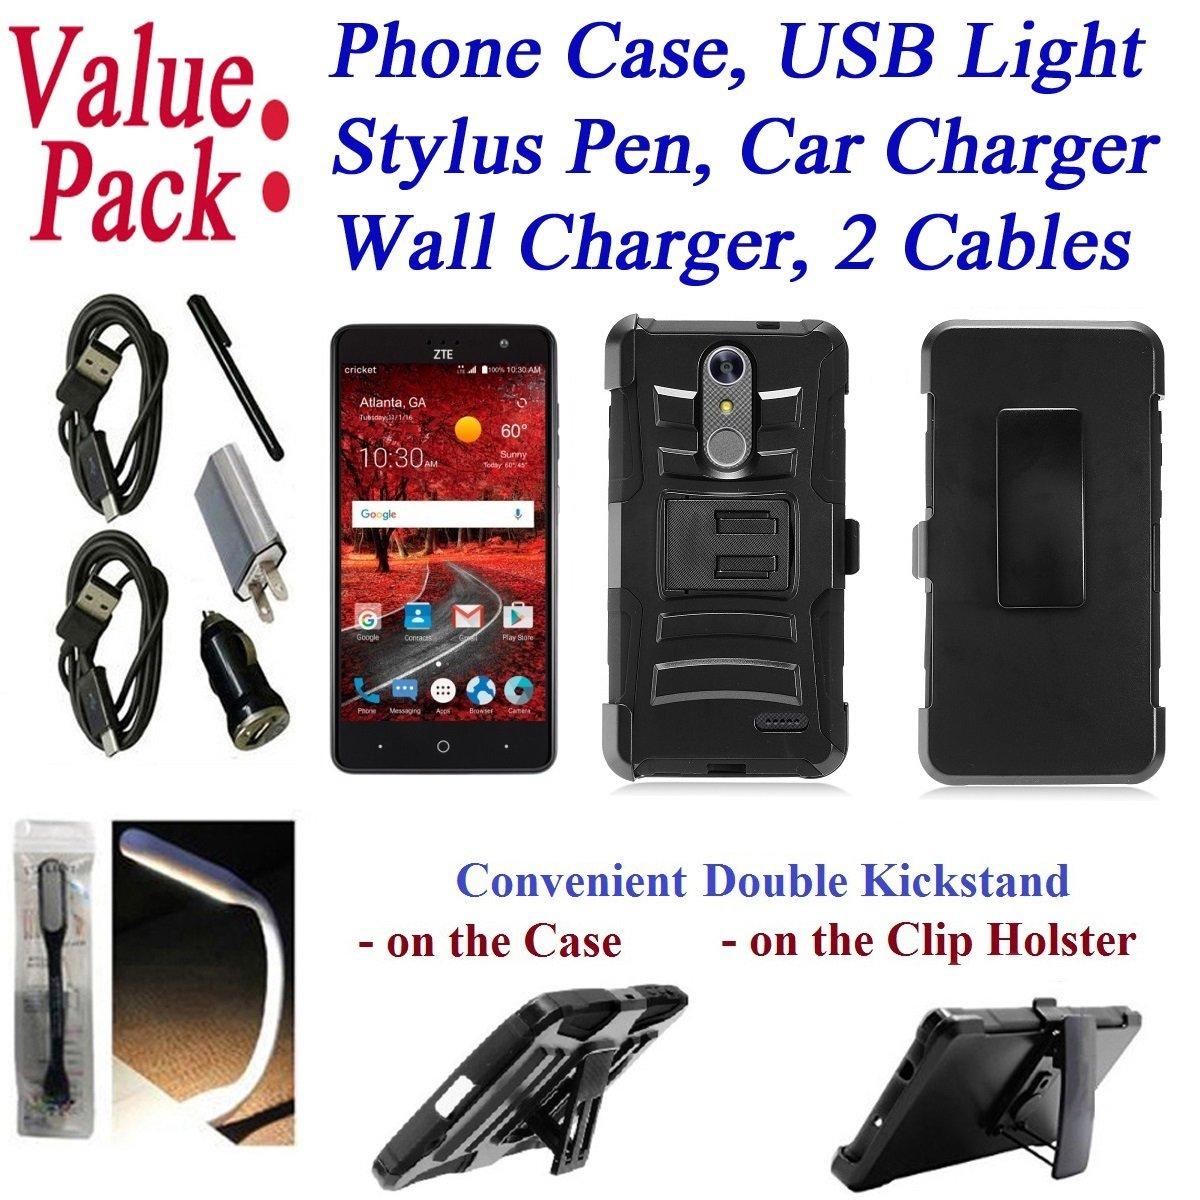 Value Pack + for 5.5'' ZTE Blade Spark ZMAX ONE Grand X4 Case Phone Case Belt Clip Holster Double Kick Stands Hybrid Biking Bumper Cover (Black)